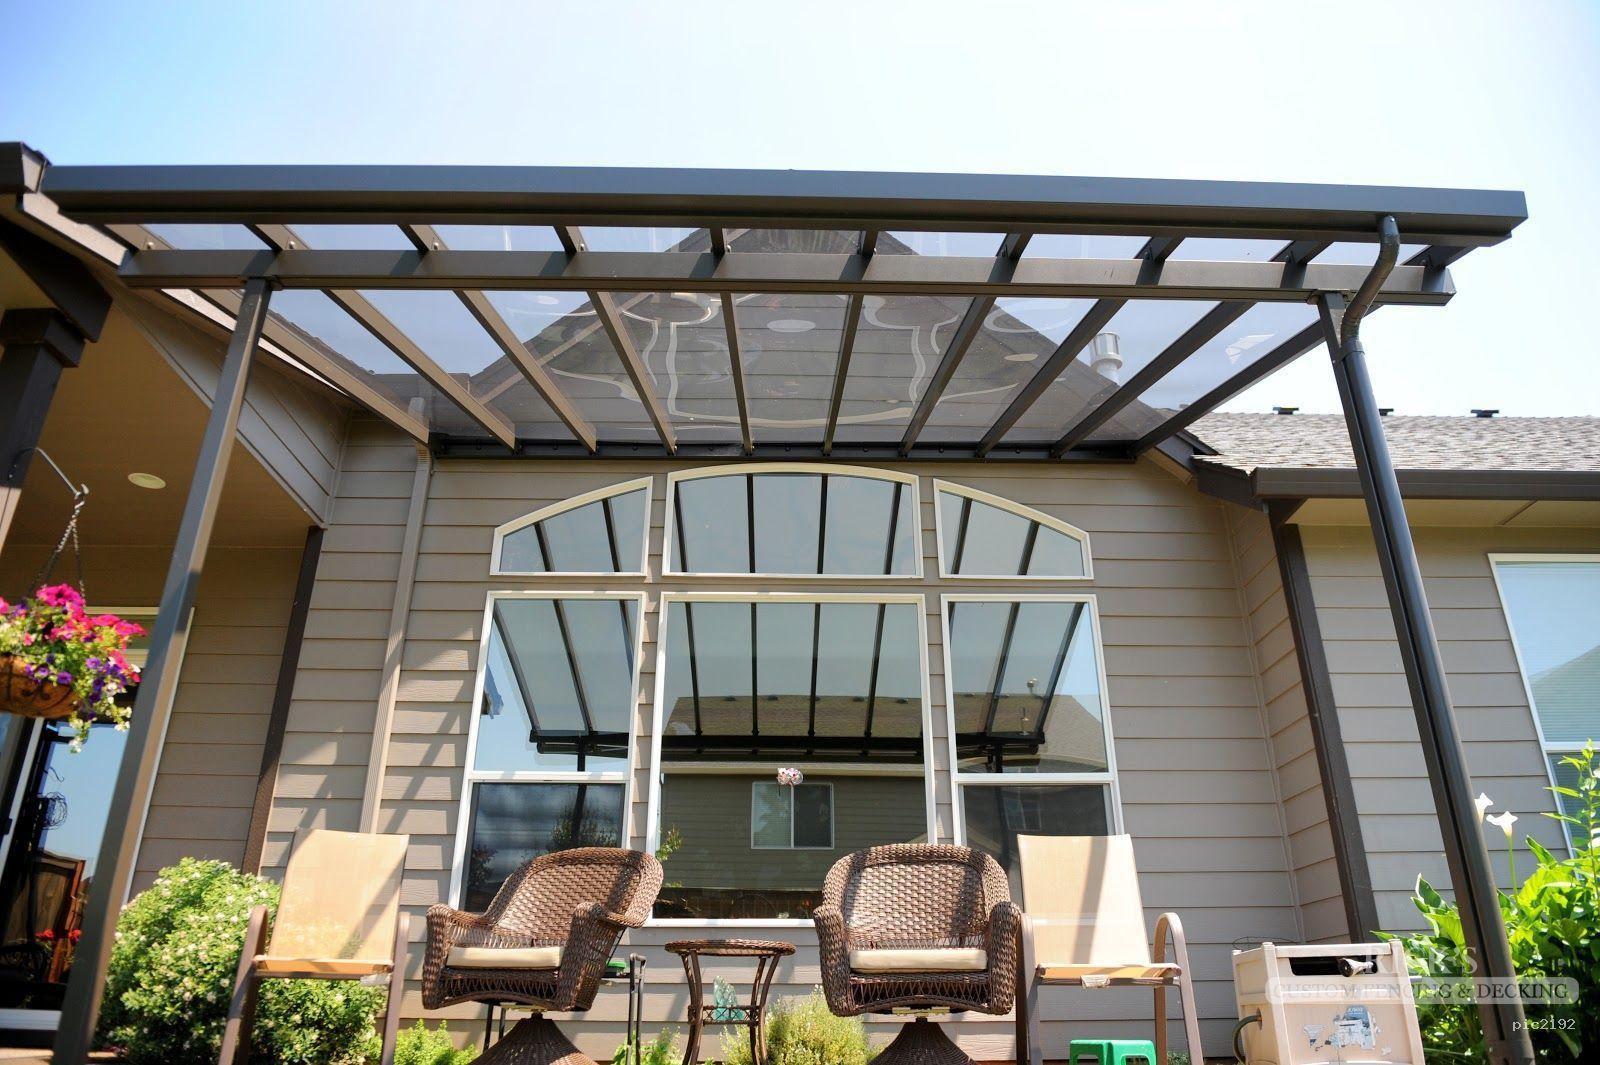 Aluminum patio covers & aluminum patio cover kits at ... on Patio Cover Ideas Uk id=53679